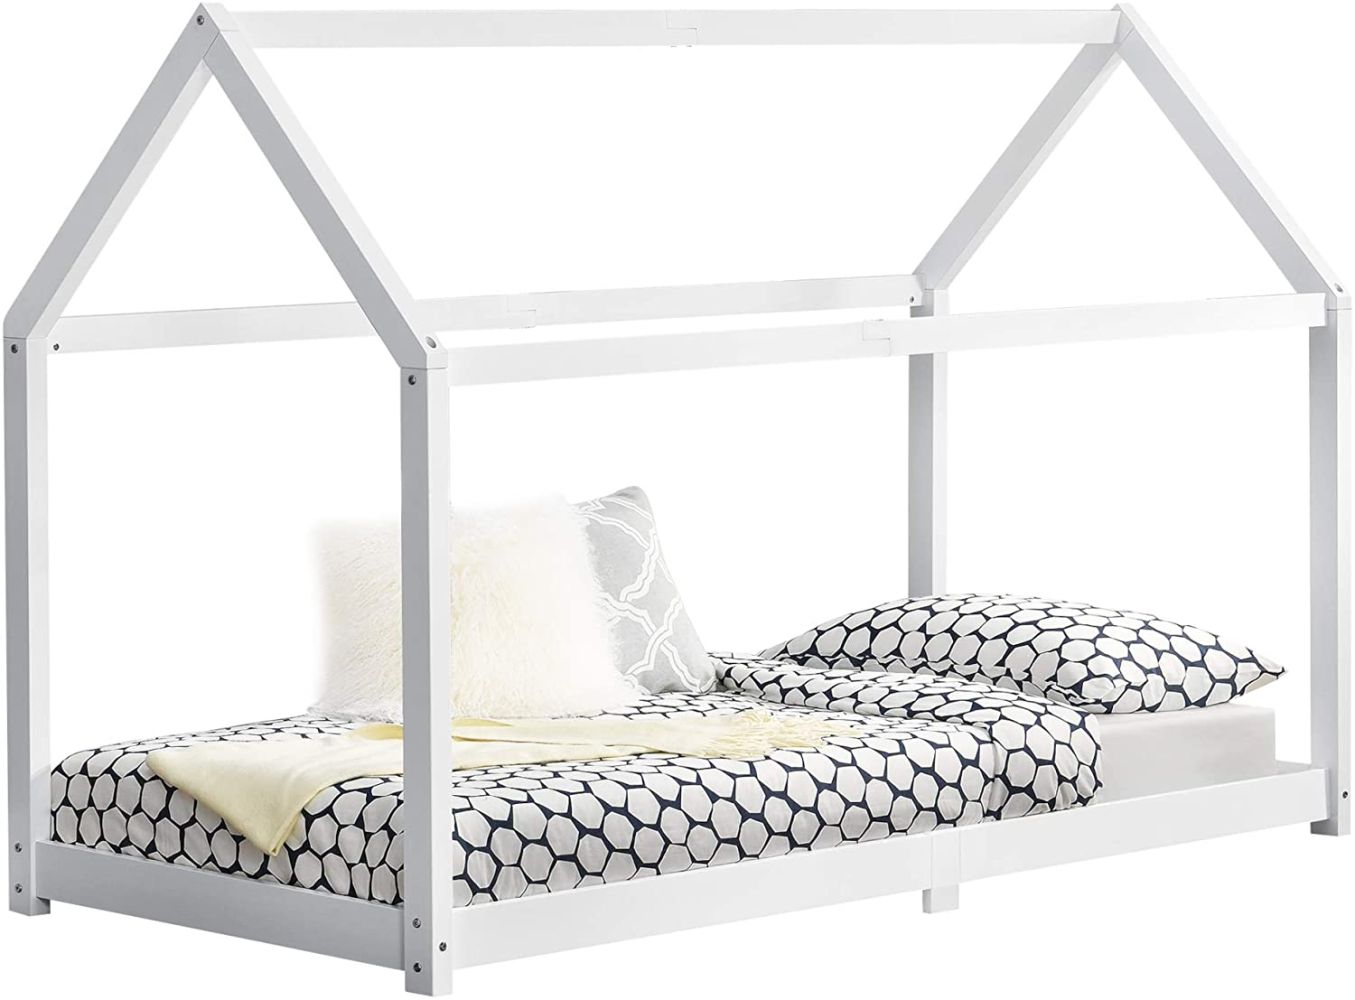 en.casa 'Embrach' Hausbett weiß, 90x200cm Kiefernholz Weiß Bild 1